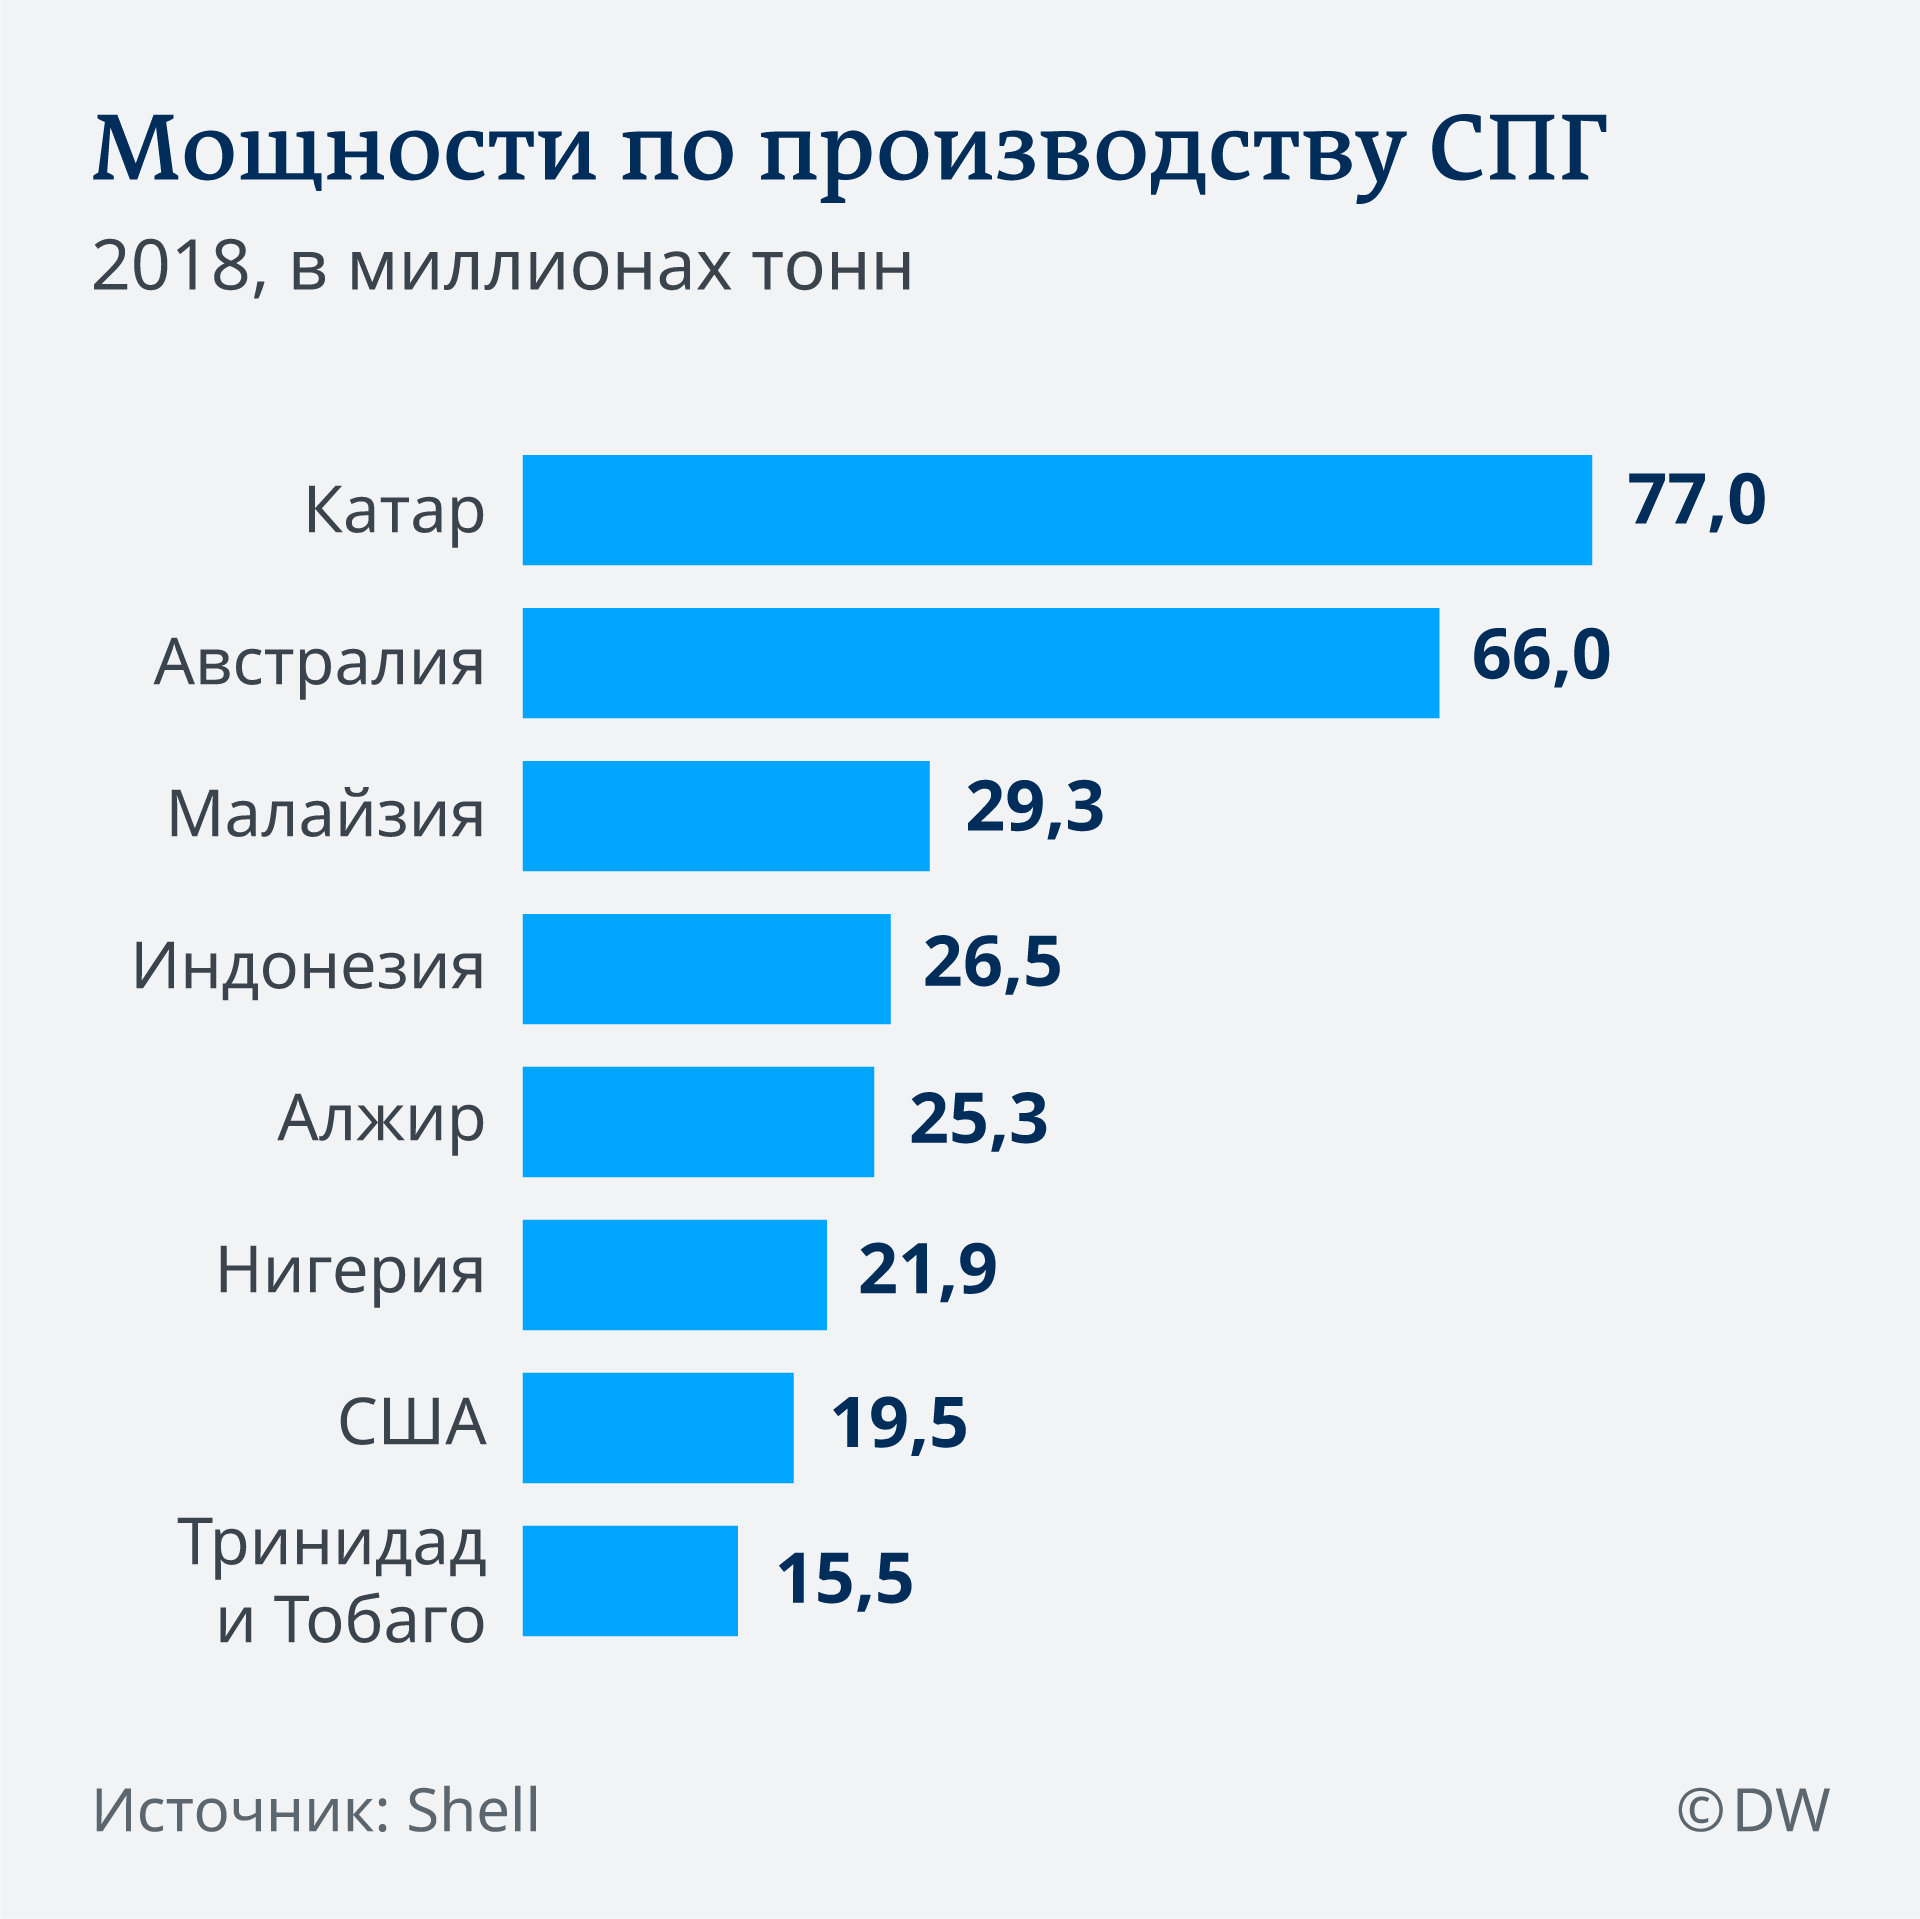 Инфографика: Мощности по производству СПГ